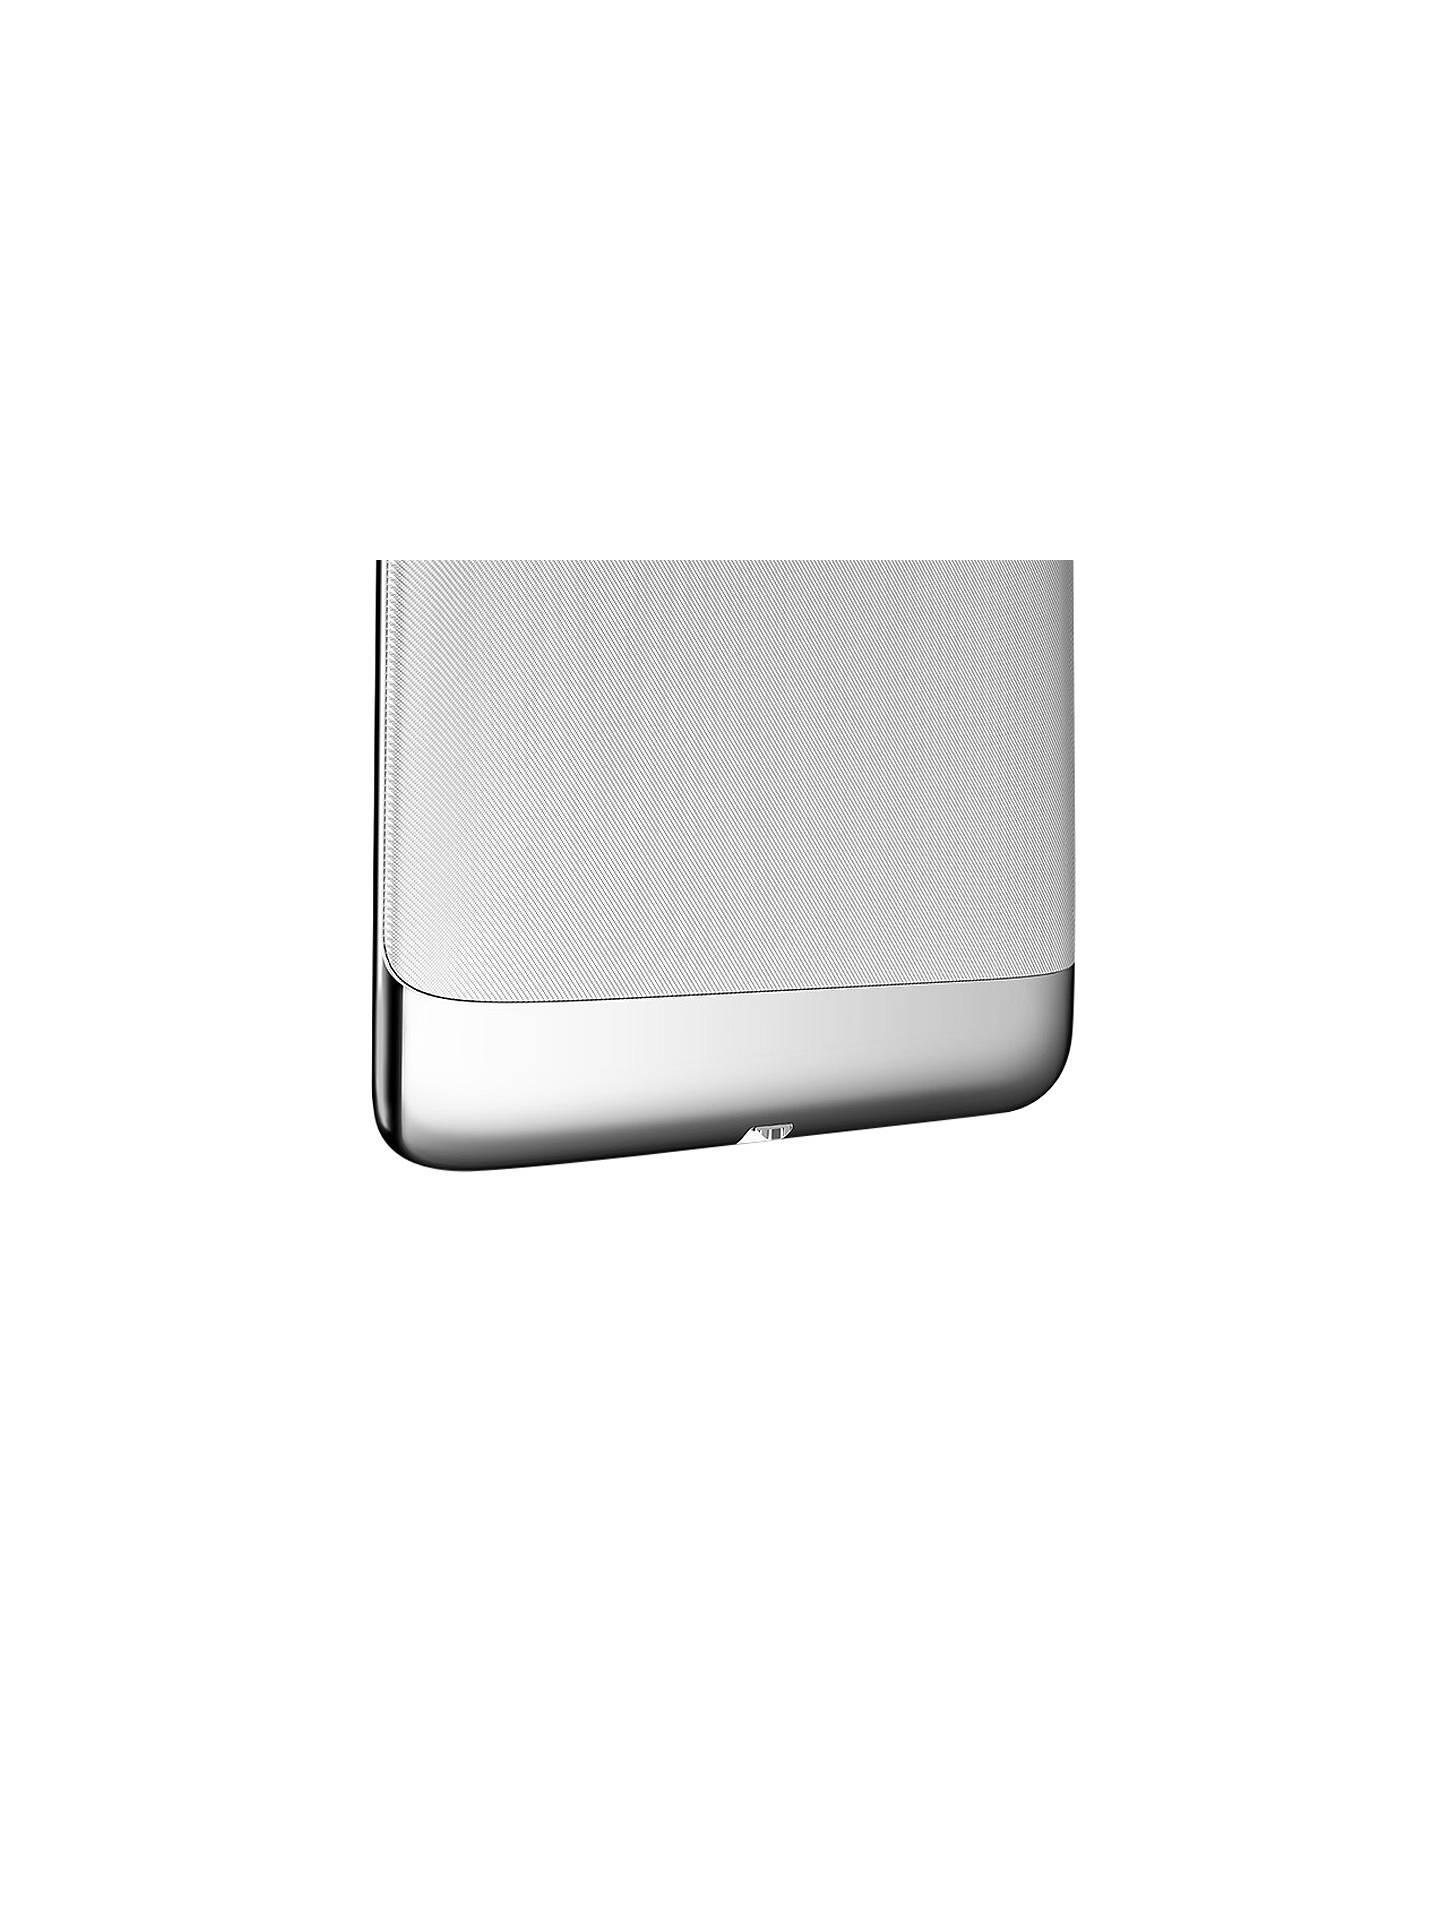 Lenovo Ideatab S5000 Tablet Quad Core Processor Android 7 Wi Fi Buylenovo